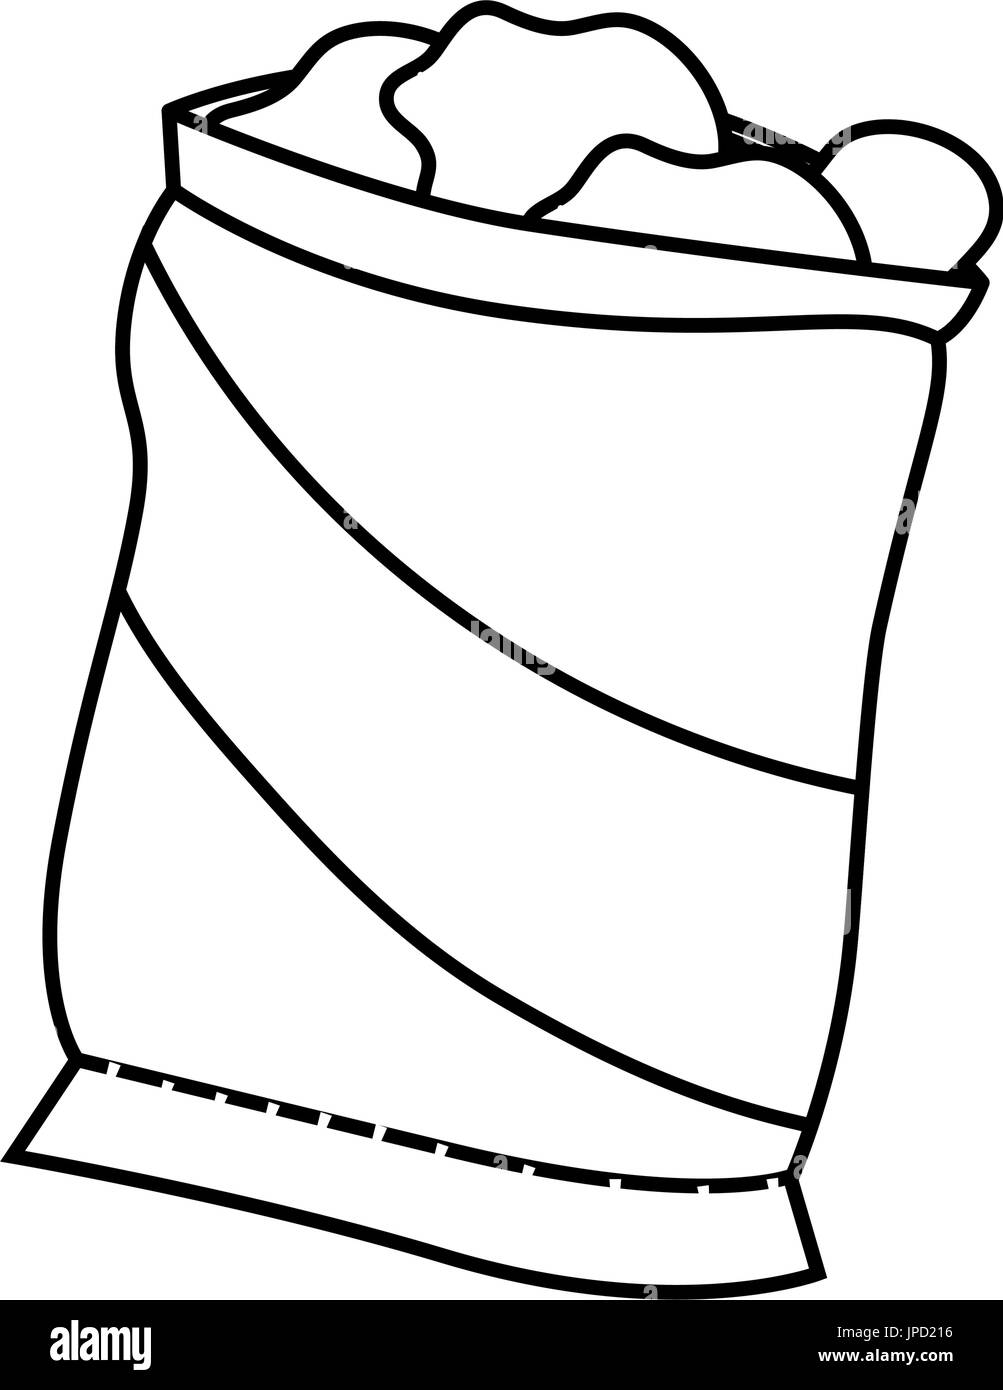 potato chip bag black and white stock photos images alamy. Black Bedroom Furniture Sets. Home Design Ideas